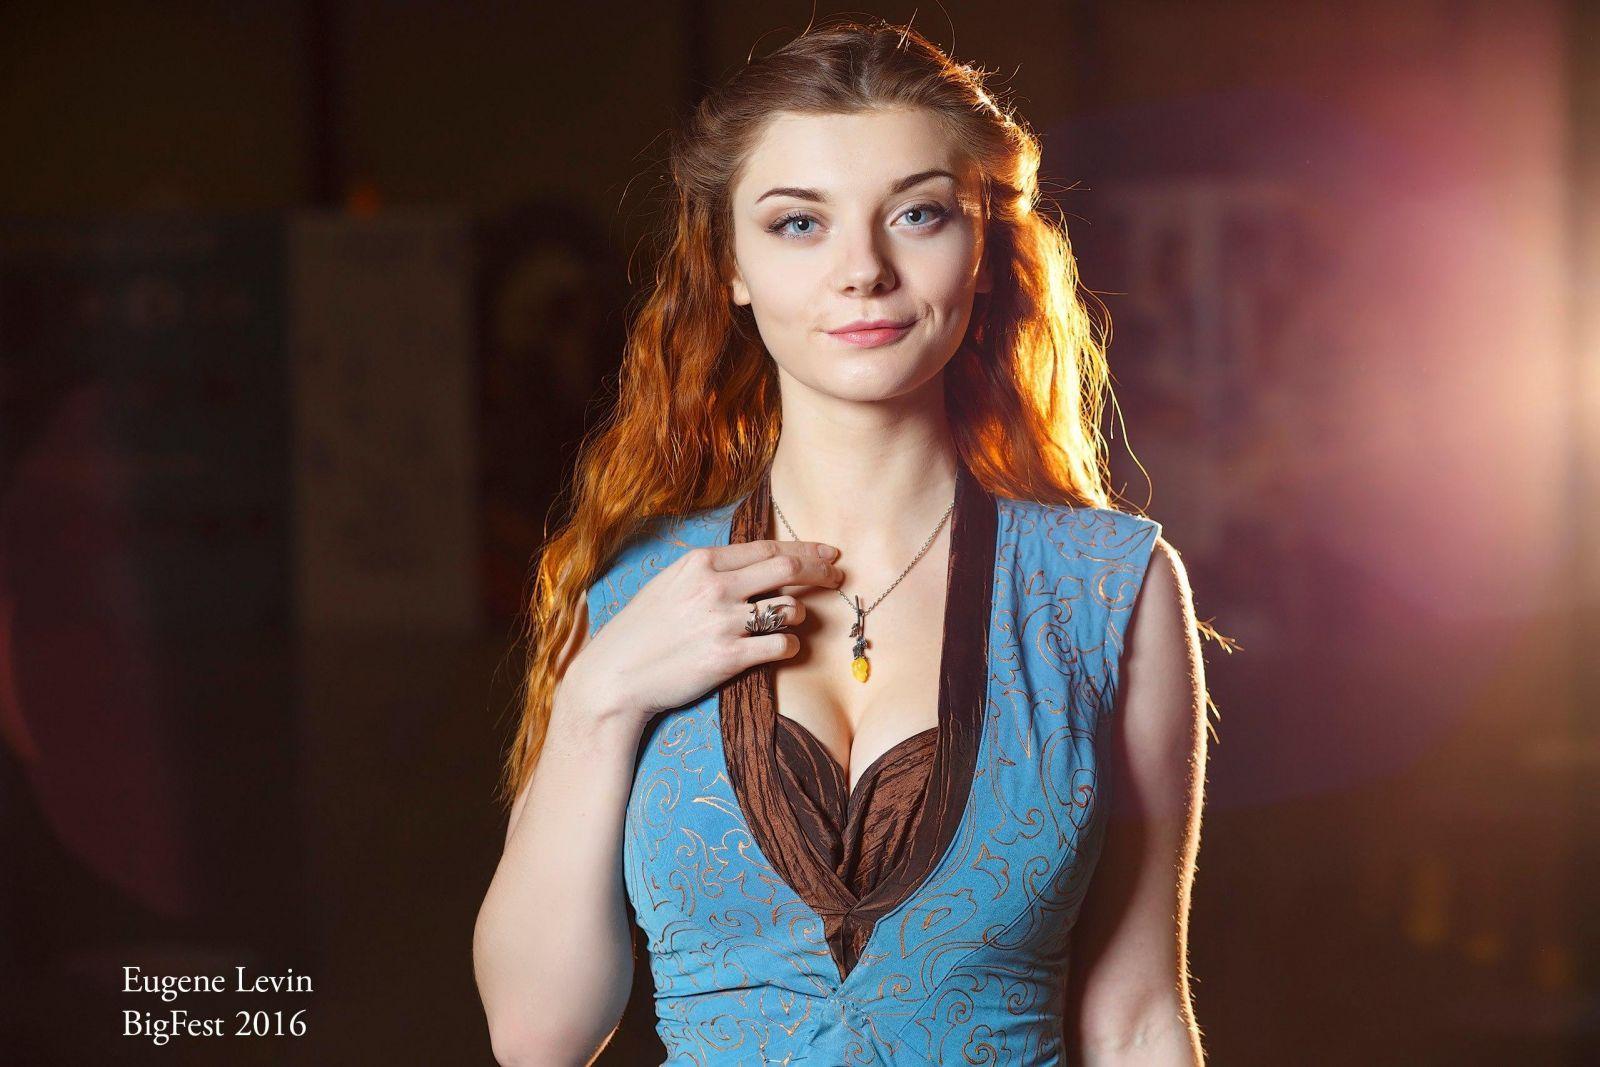 Cosplay  sc 1 st  Pinterest & Margaery Tyrell Is That You? | Margaery tyrell and Cosplay pezcame.com